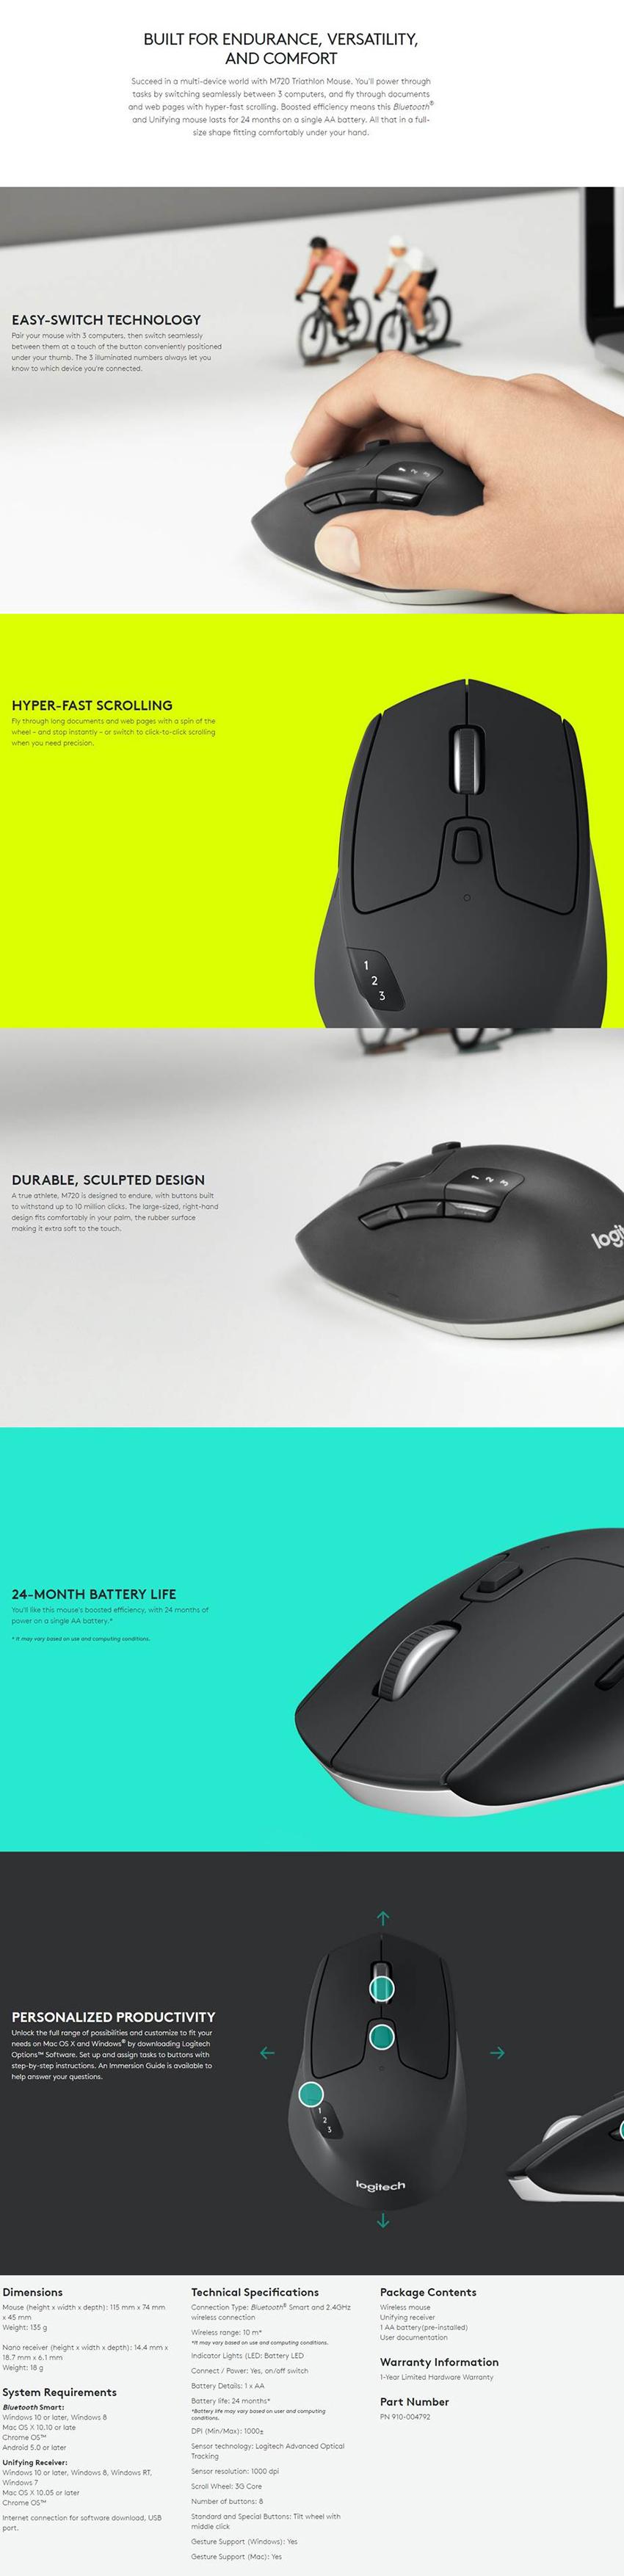 [BNIB] Logitech M720 Triathlon Multi-Computer Mouse